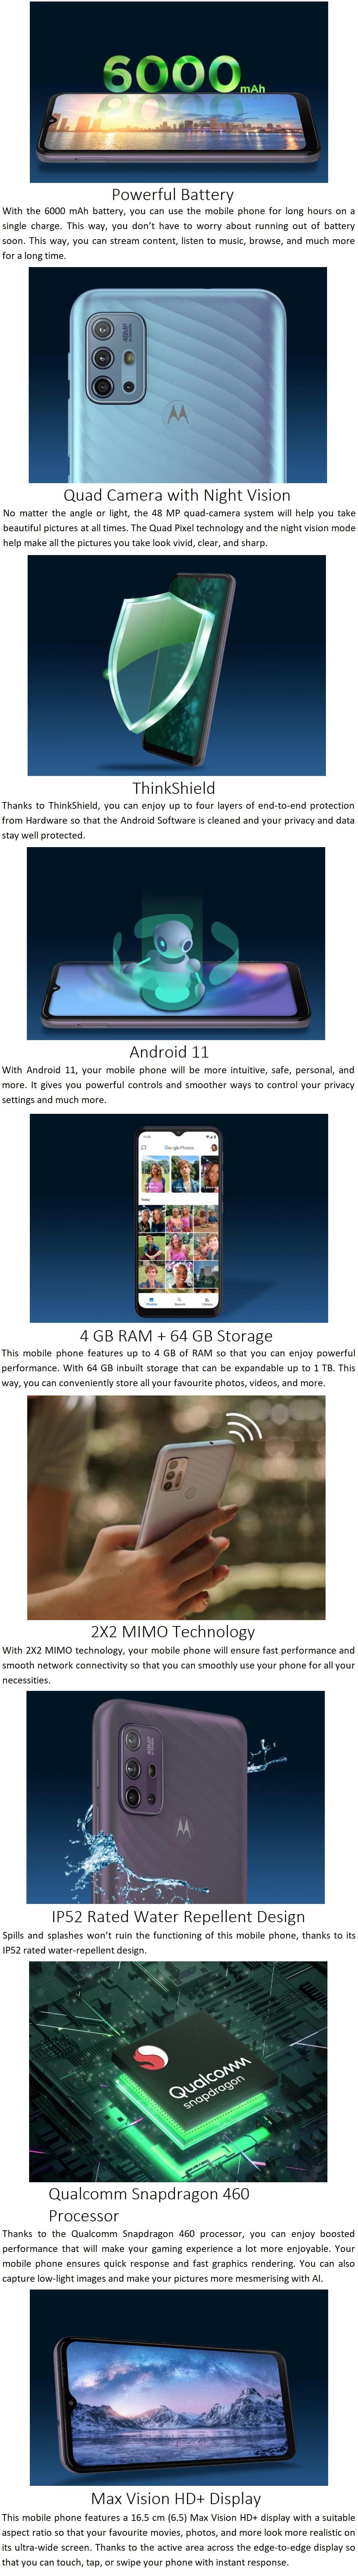 https://assetscdn1.paytm.com/images/catalog/product/F/FA/FASARYANVEDA-UNARYA175232D3BA940E/41.png